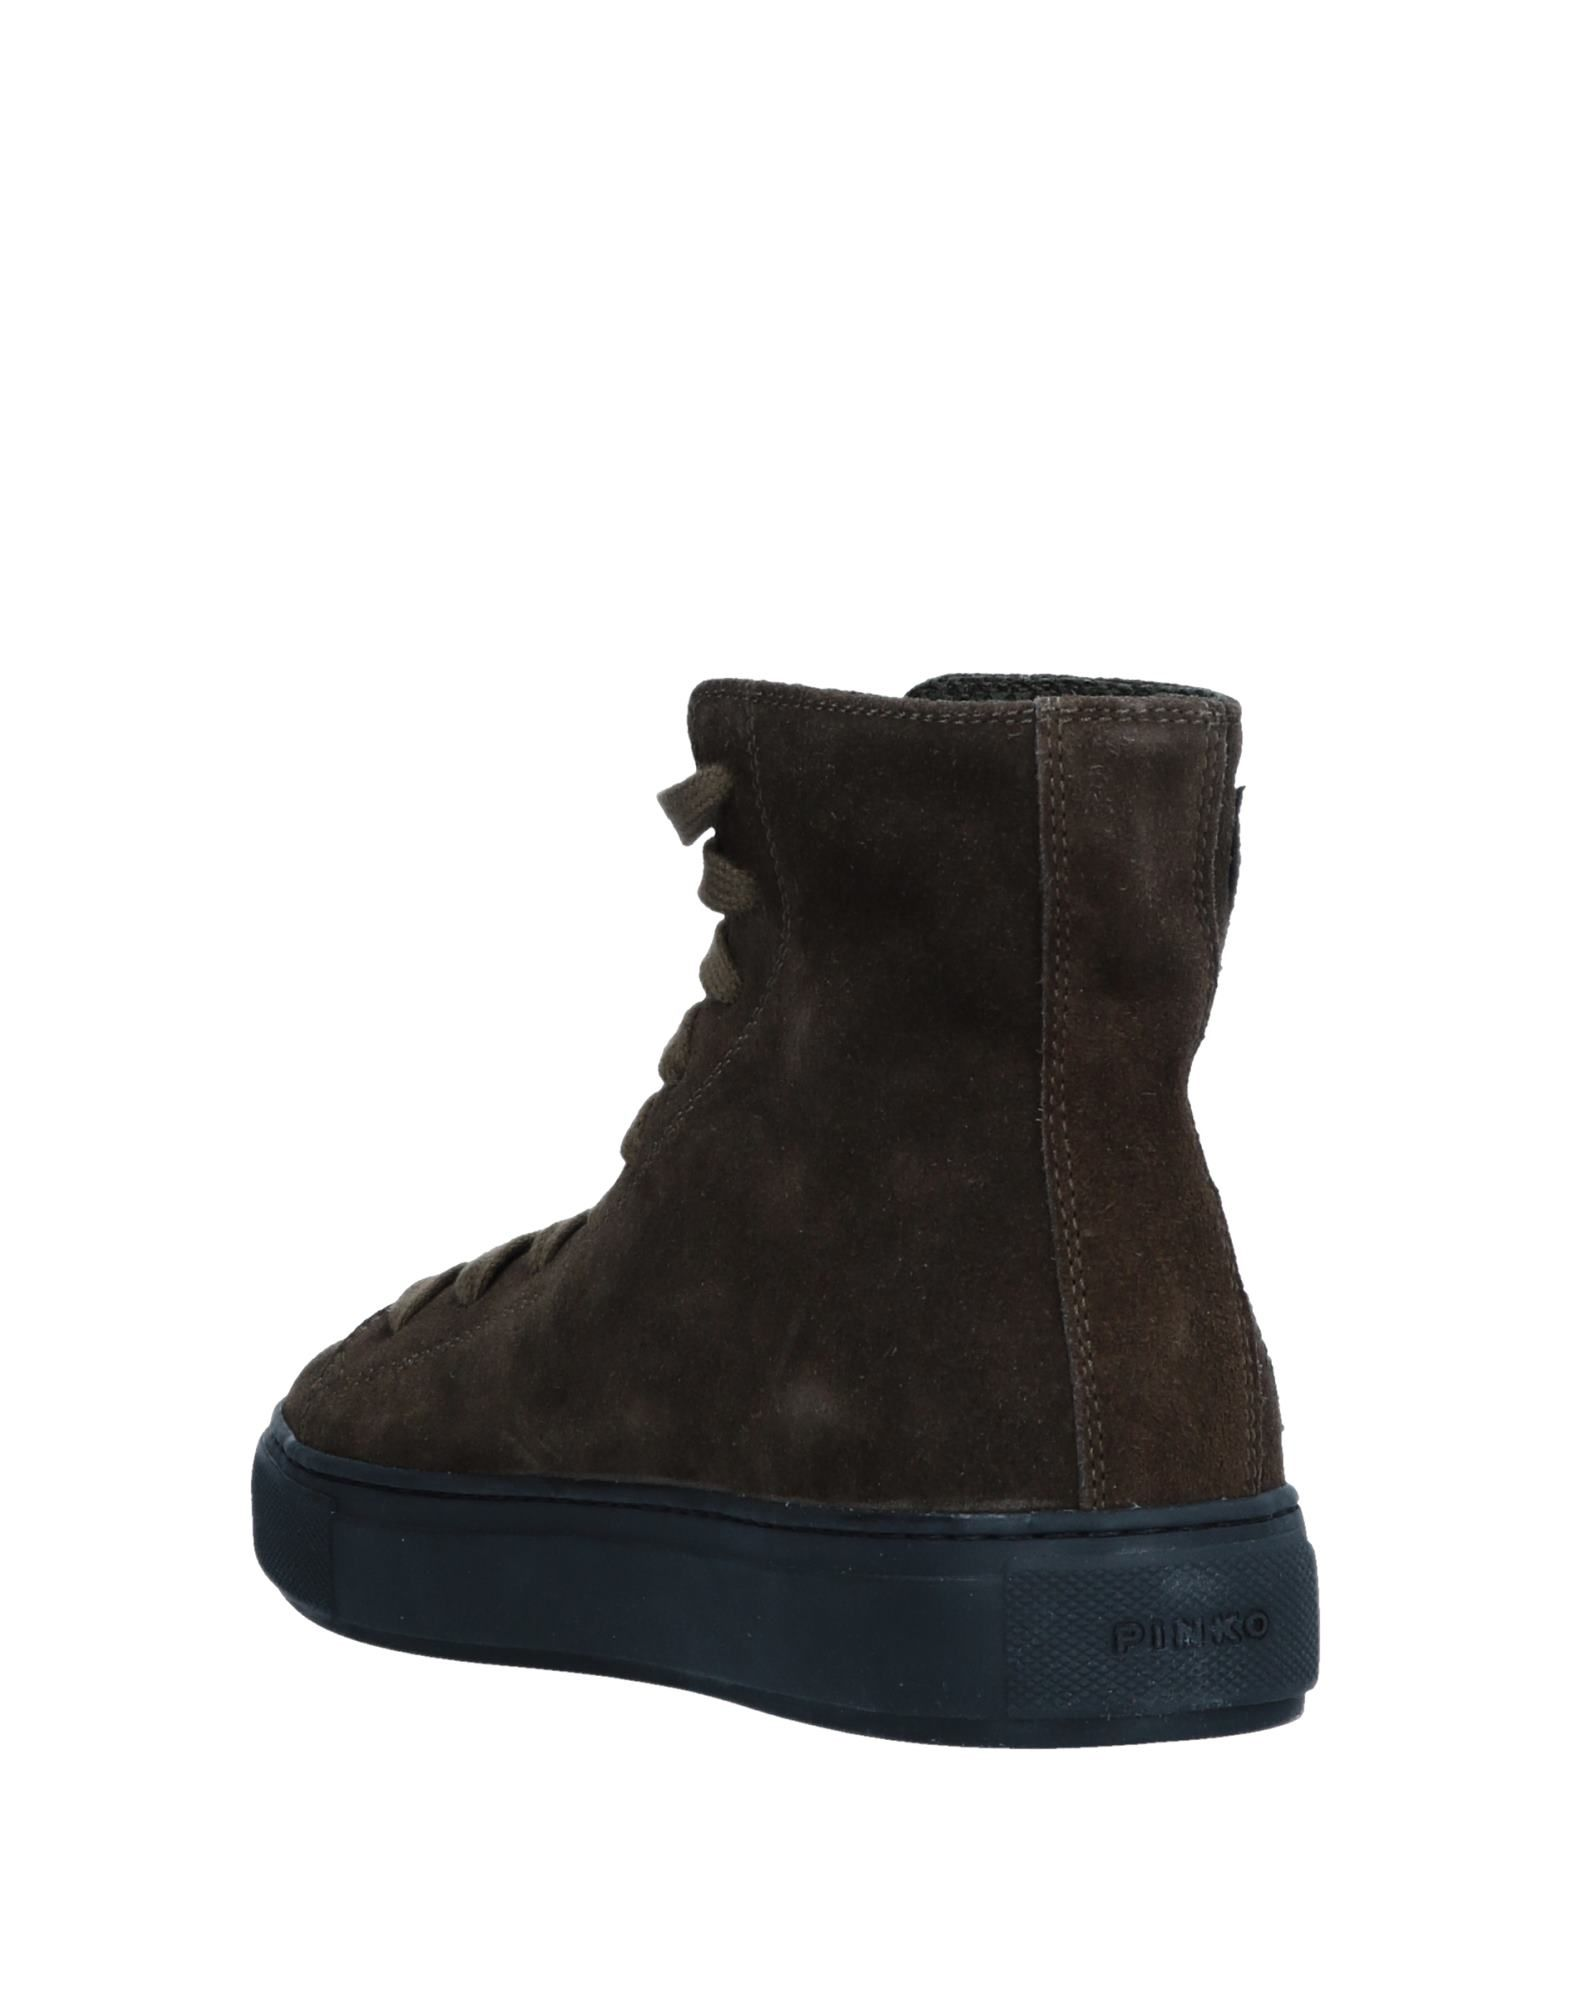 Stilvolle Damen billige Schuhe Pinko Sneakers Damen Stilvolle  11554688SF a54bb3